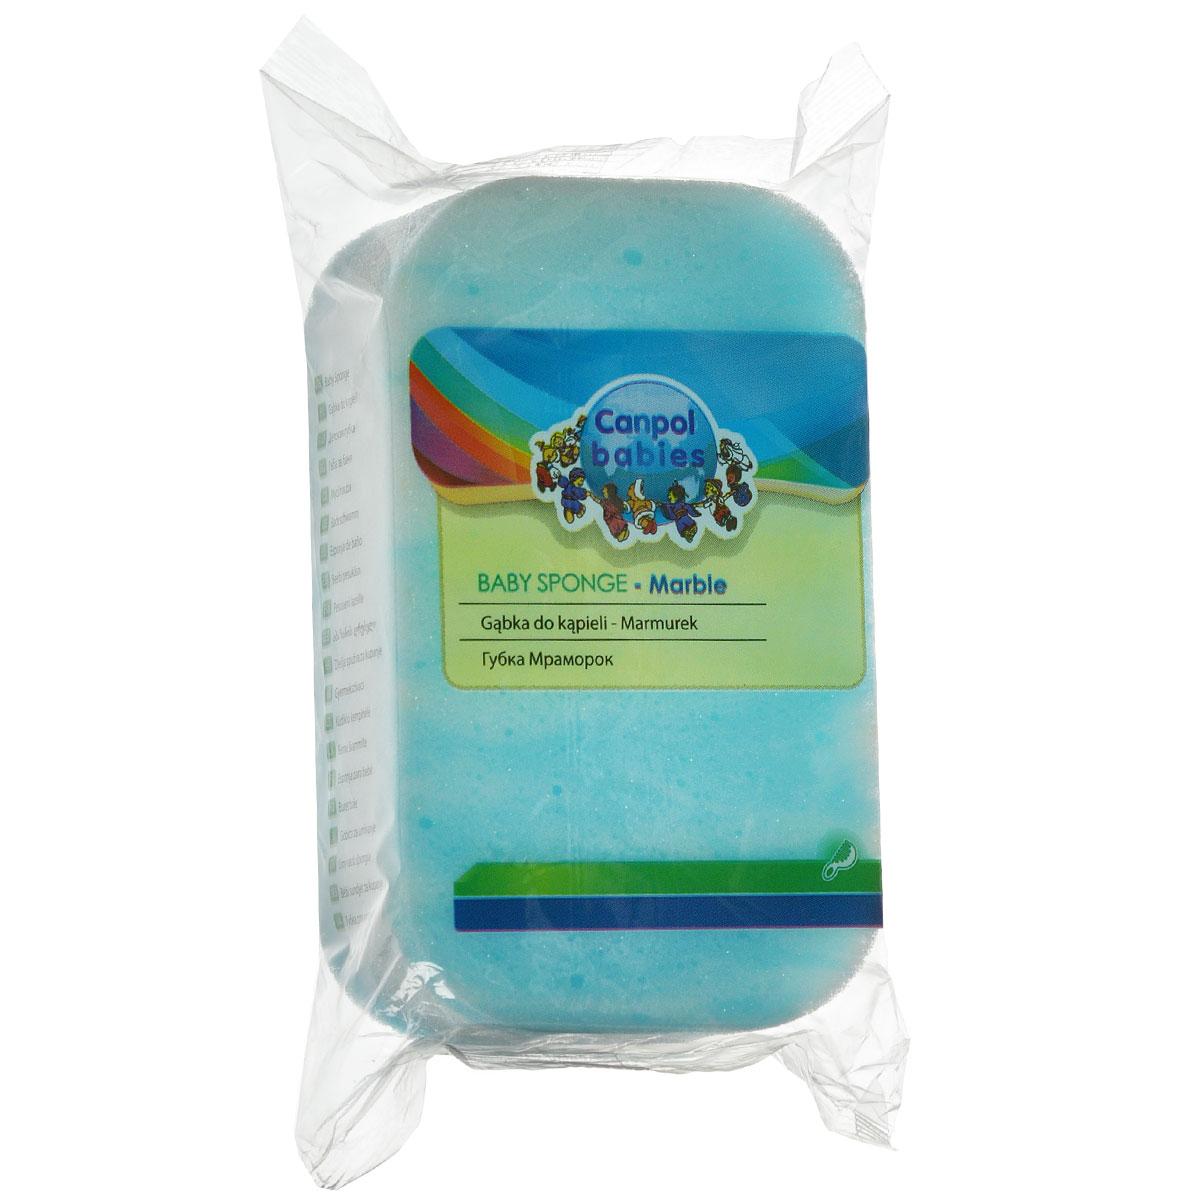 Canpol Babies Губка для купания Marble цвет голубой  canpol babies губка для купания marble цвет голубой